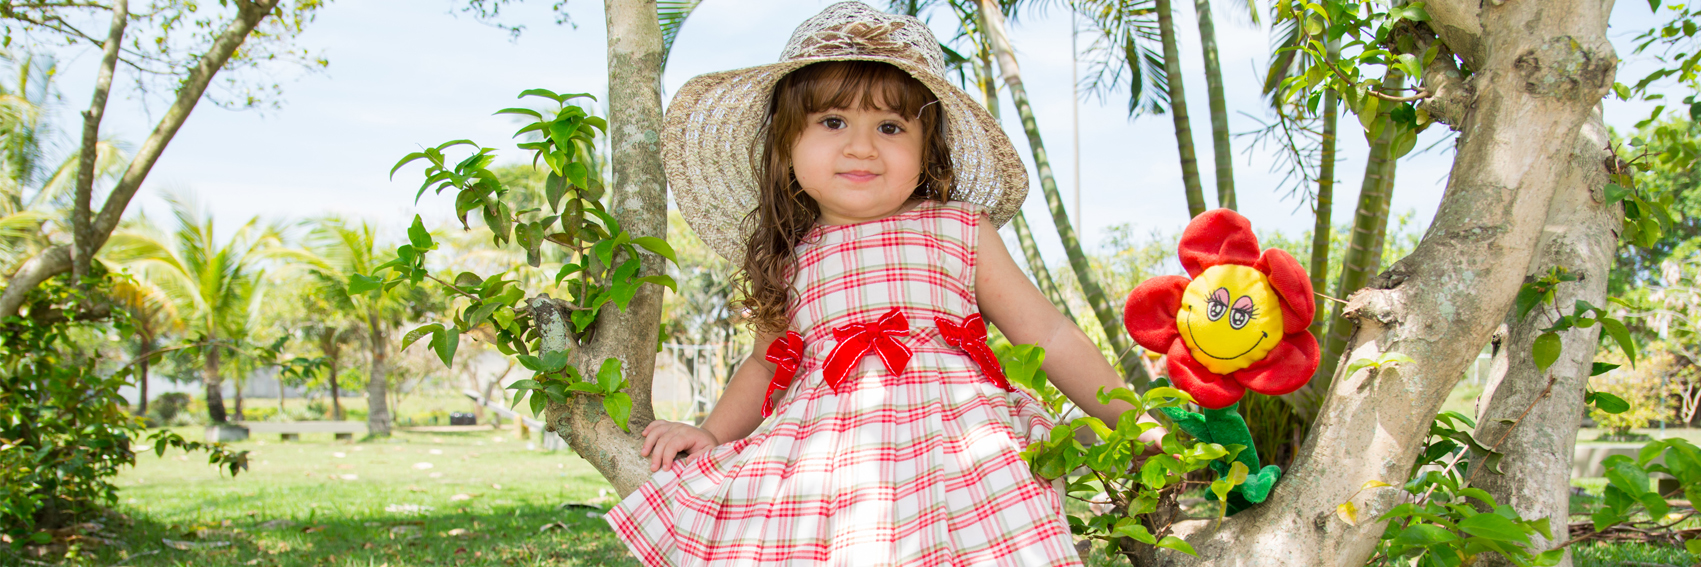 fotografia-BOOK-INFANTIL-filmagens-niteroi-rj-TELA1